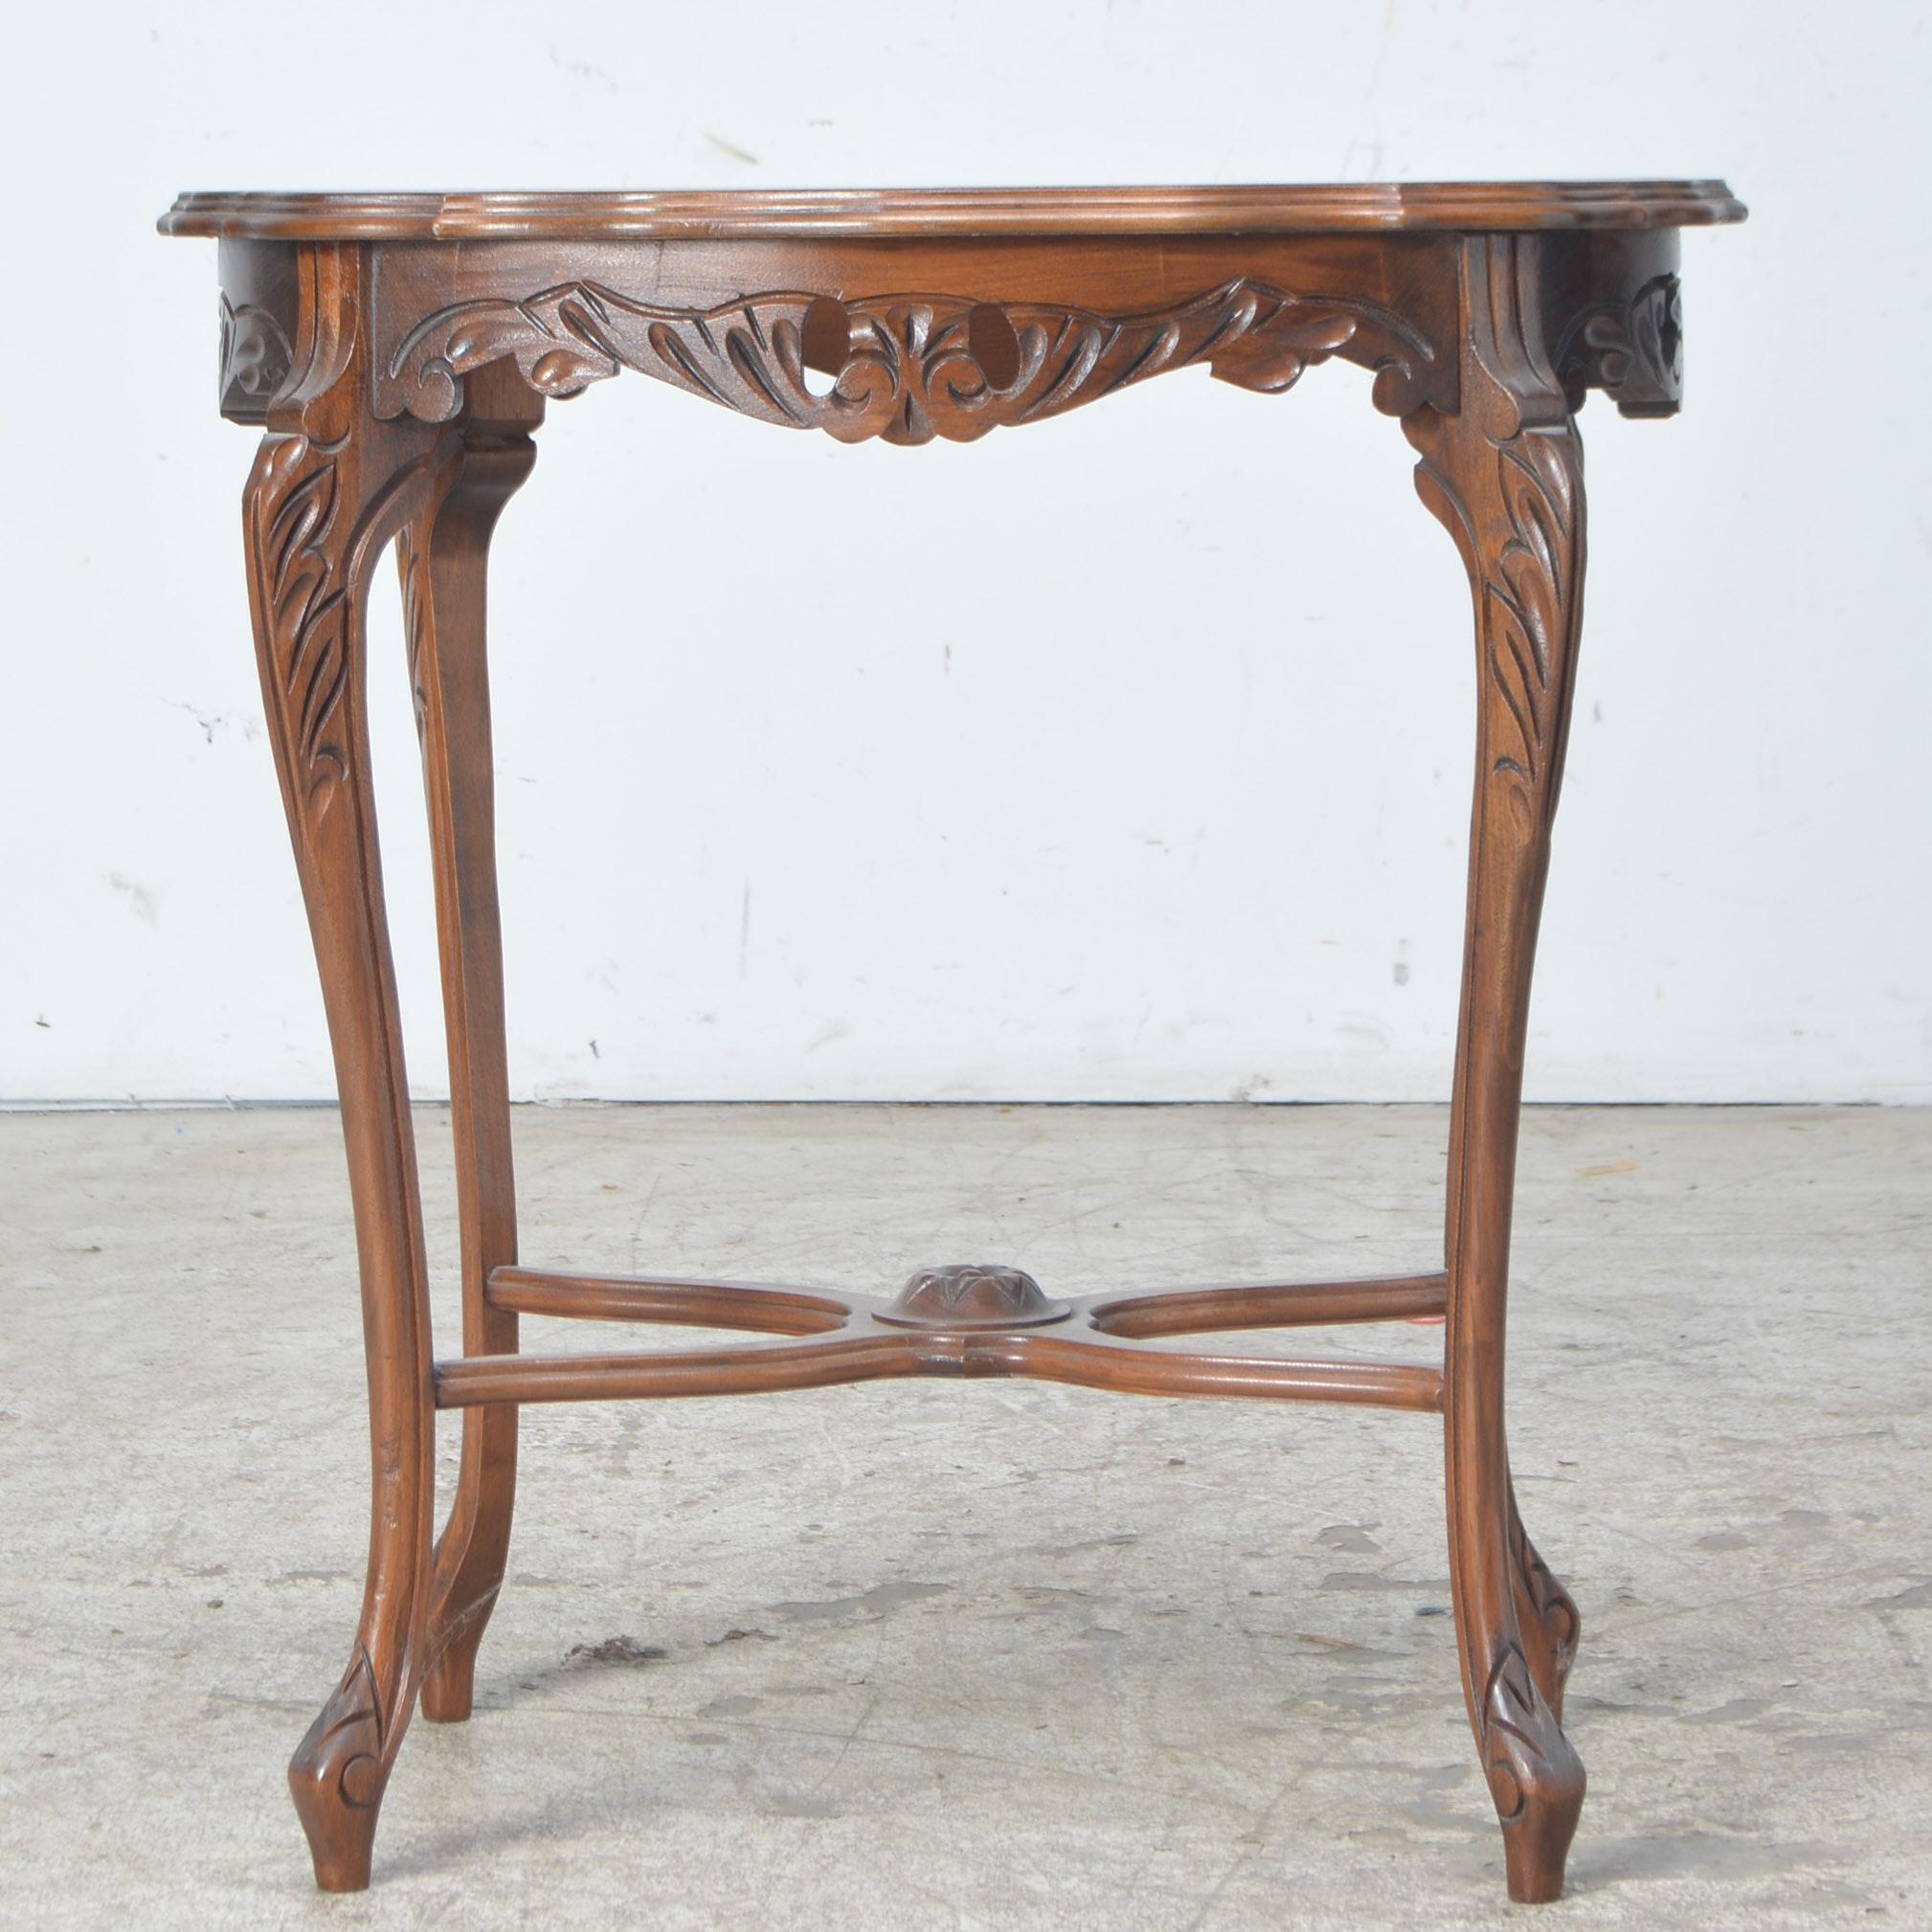 Antique Cherry Parlor Accent Table